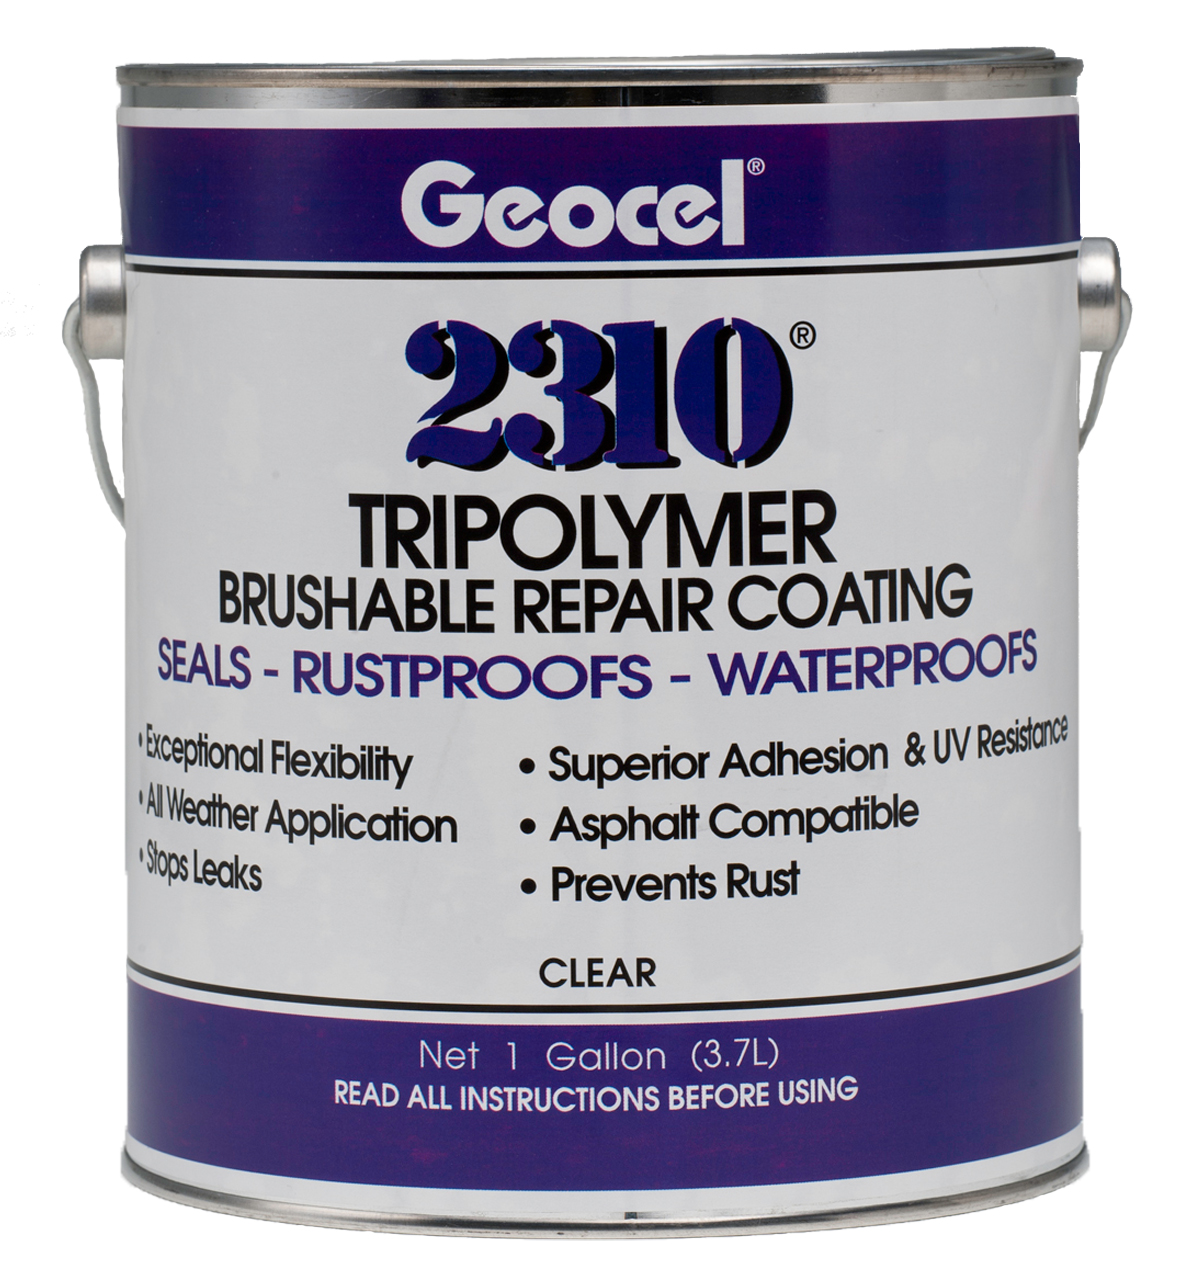 2310 174 Tripolymer Brushable Repair Coating Geocel